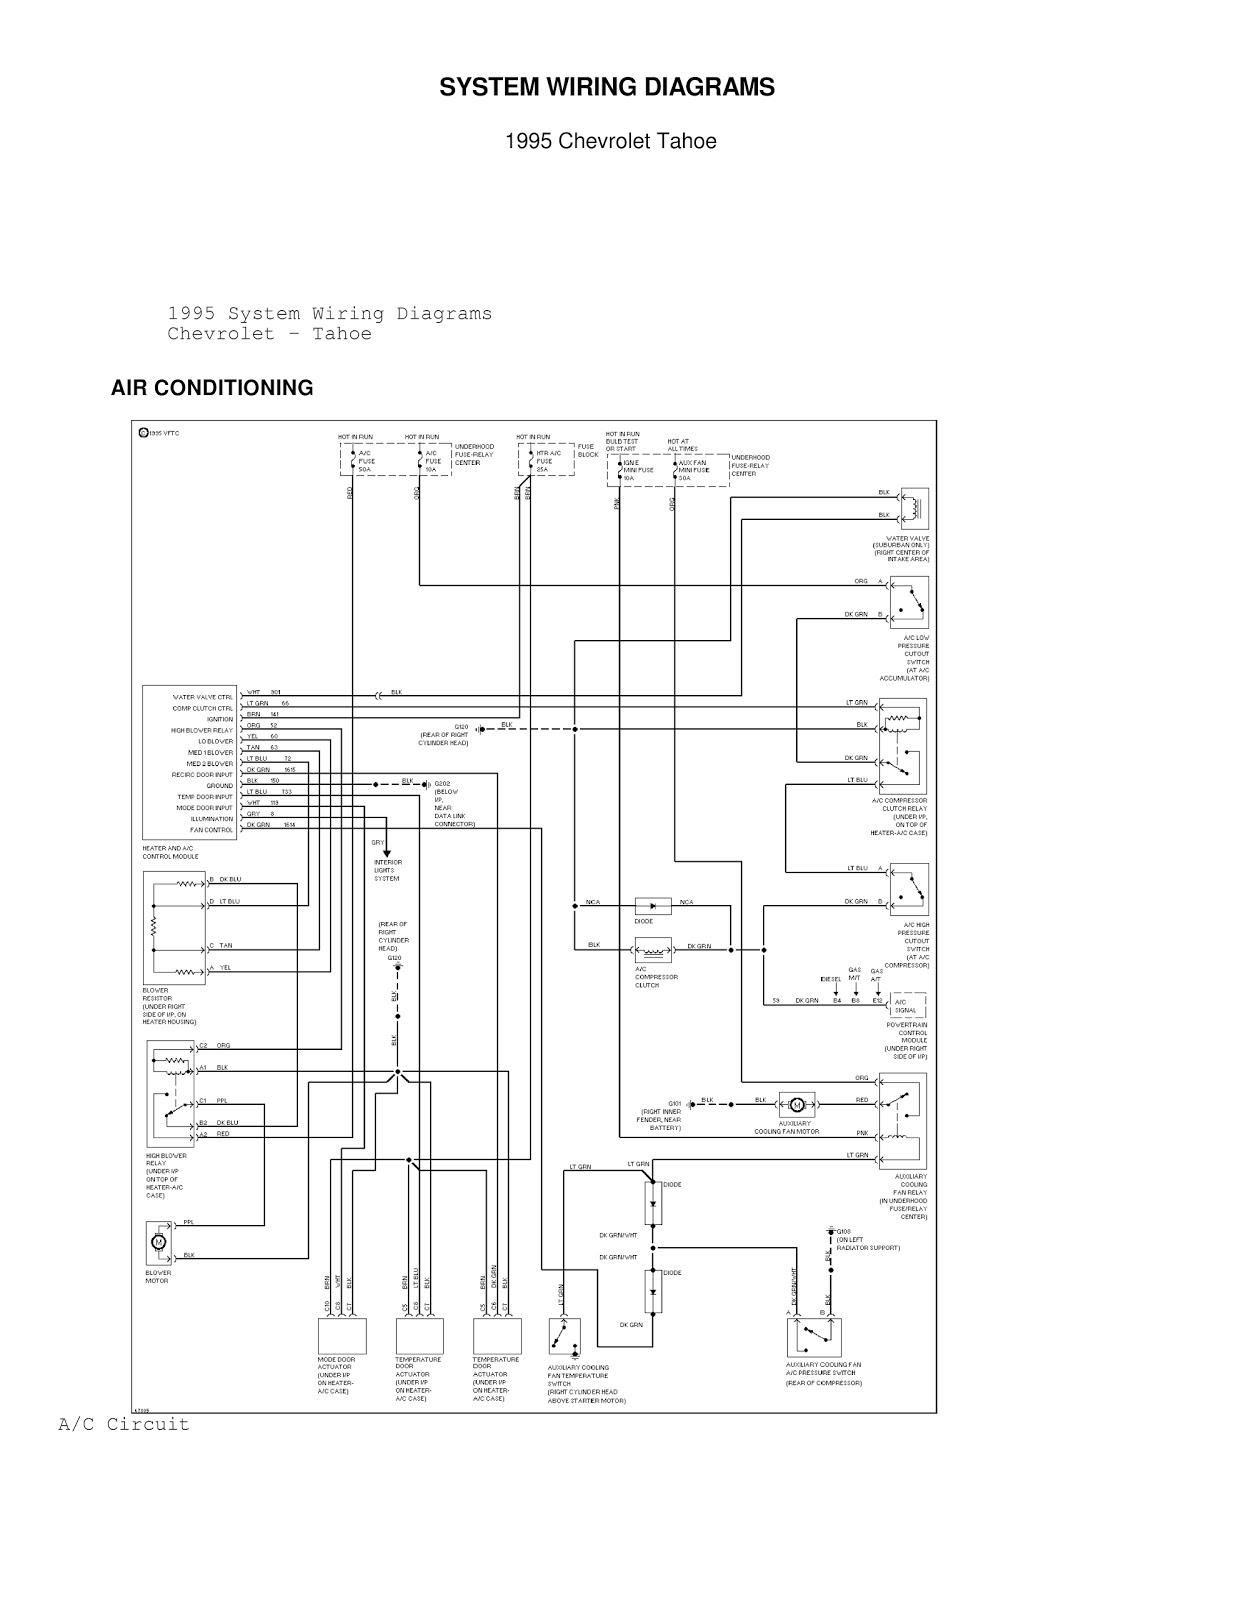 1995 chevy tahoe wiring diagram